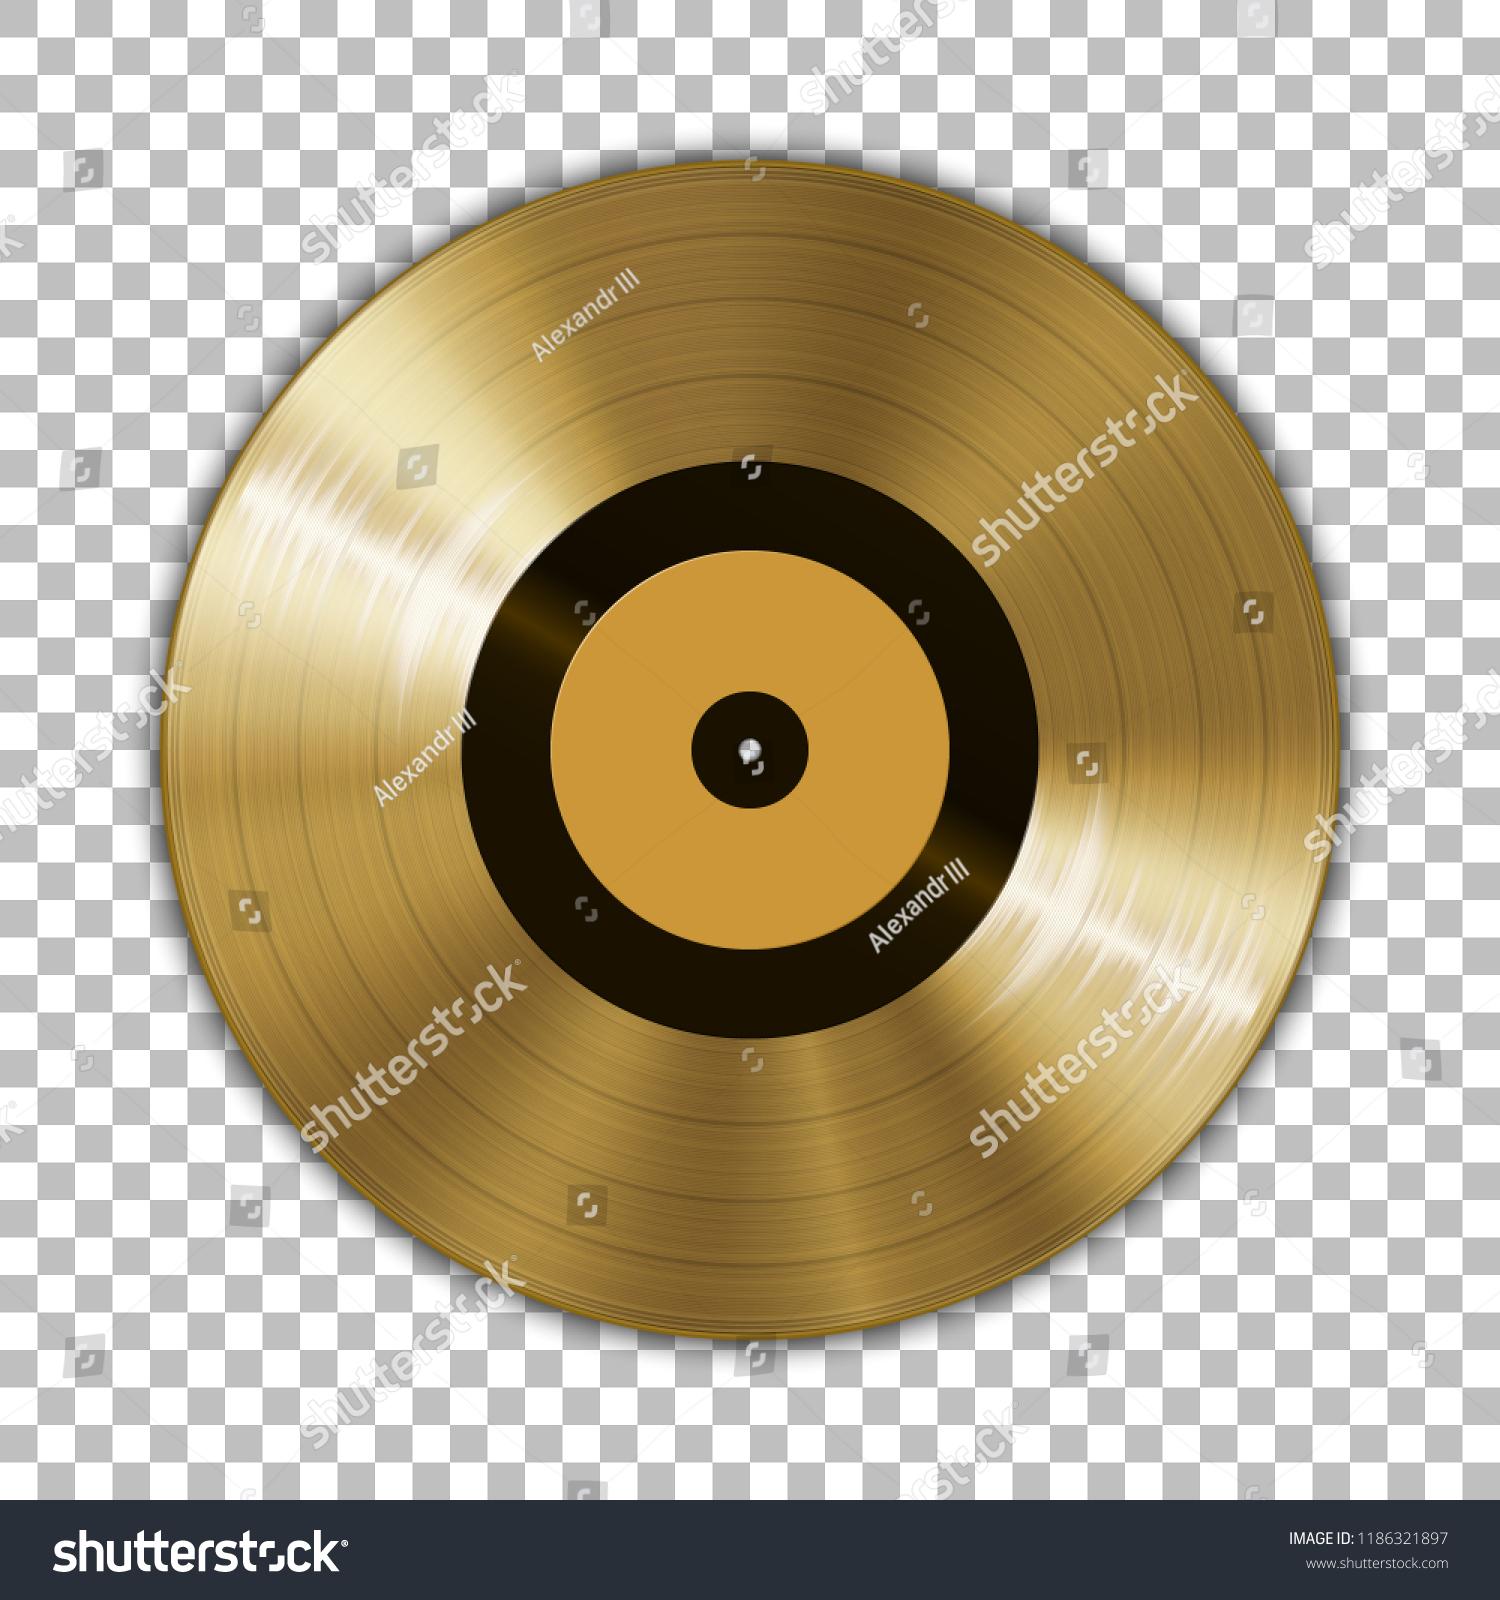 gramophone golden vinyl lp record template stock vector royalty free 1186321897 https www shutterstock com image vector gramophone golden vinyl lp record template 1186321897